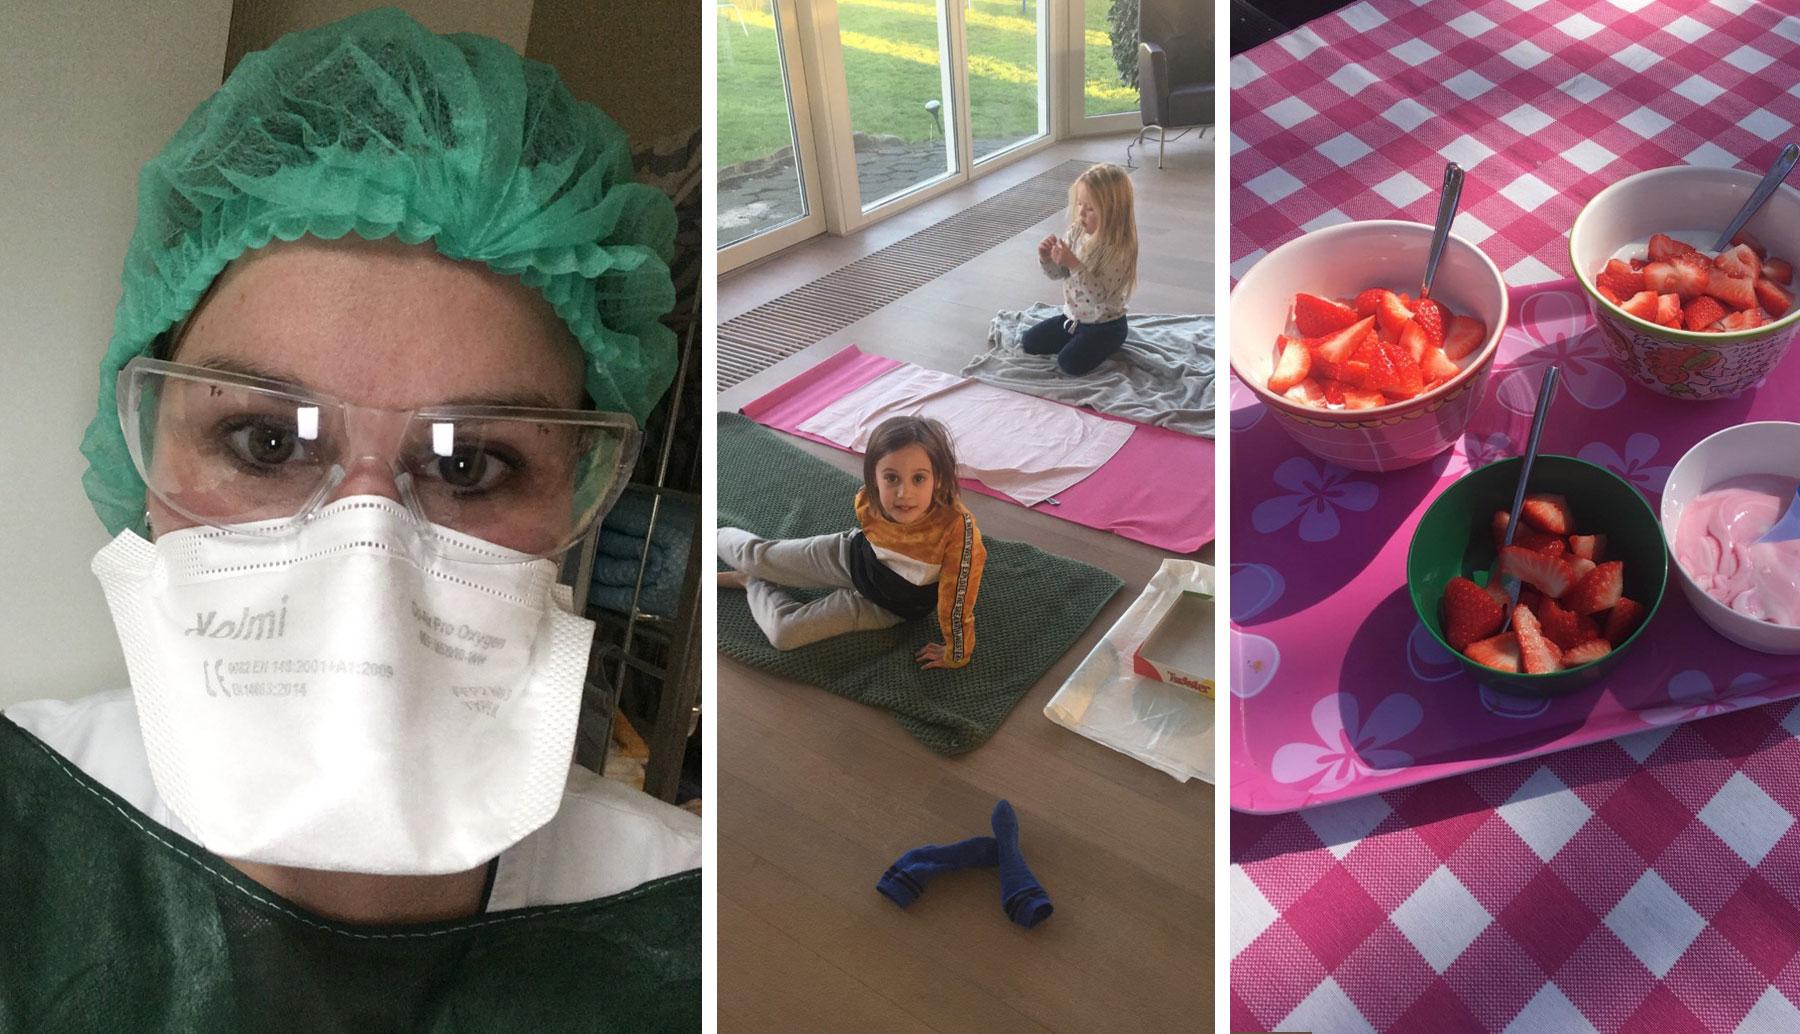 Ervaring met Zlim - IC verpleegkundige Anniek Latour